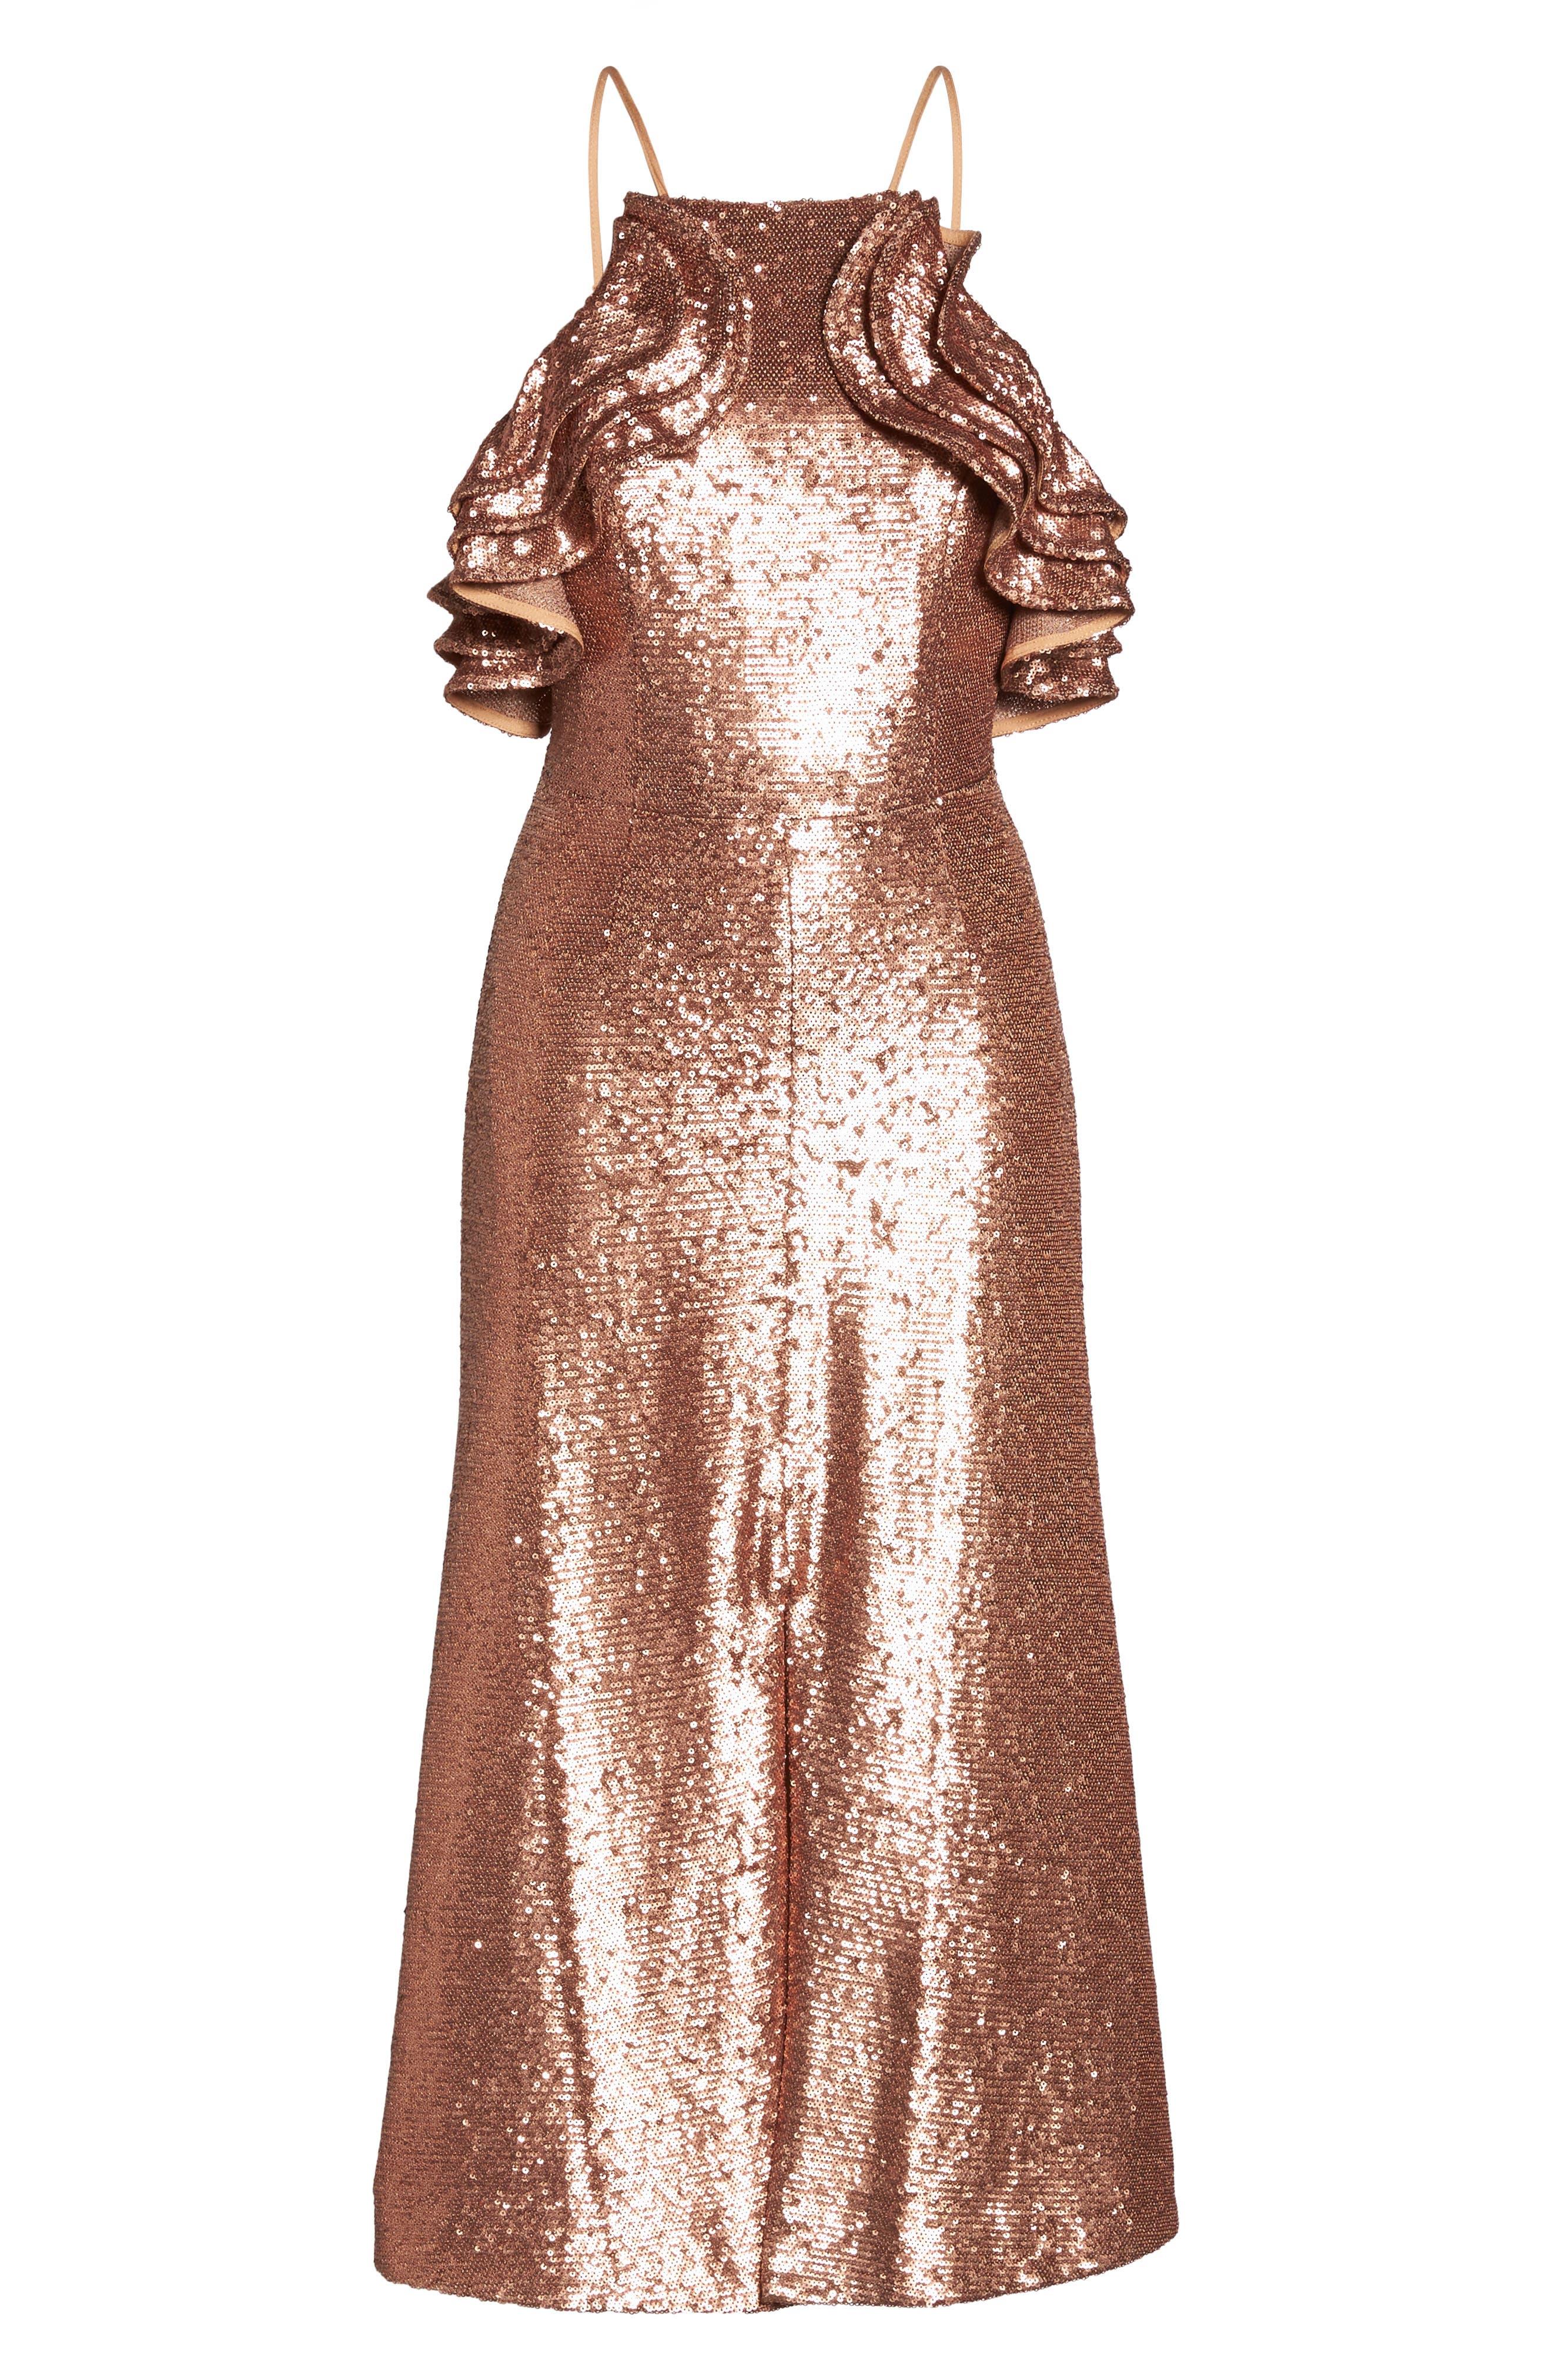 Illuminated Sequin Ruffle Midi Dress,                             Alternate thumbnail 7, color,                             Copper